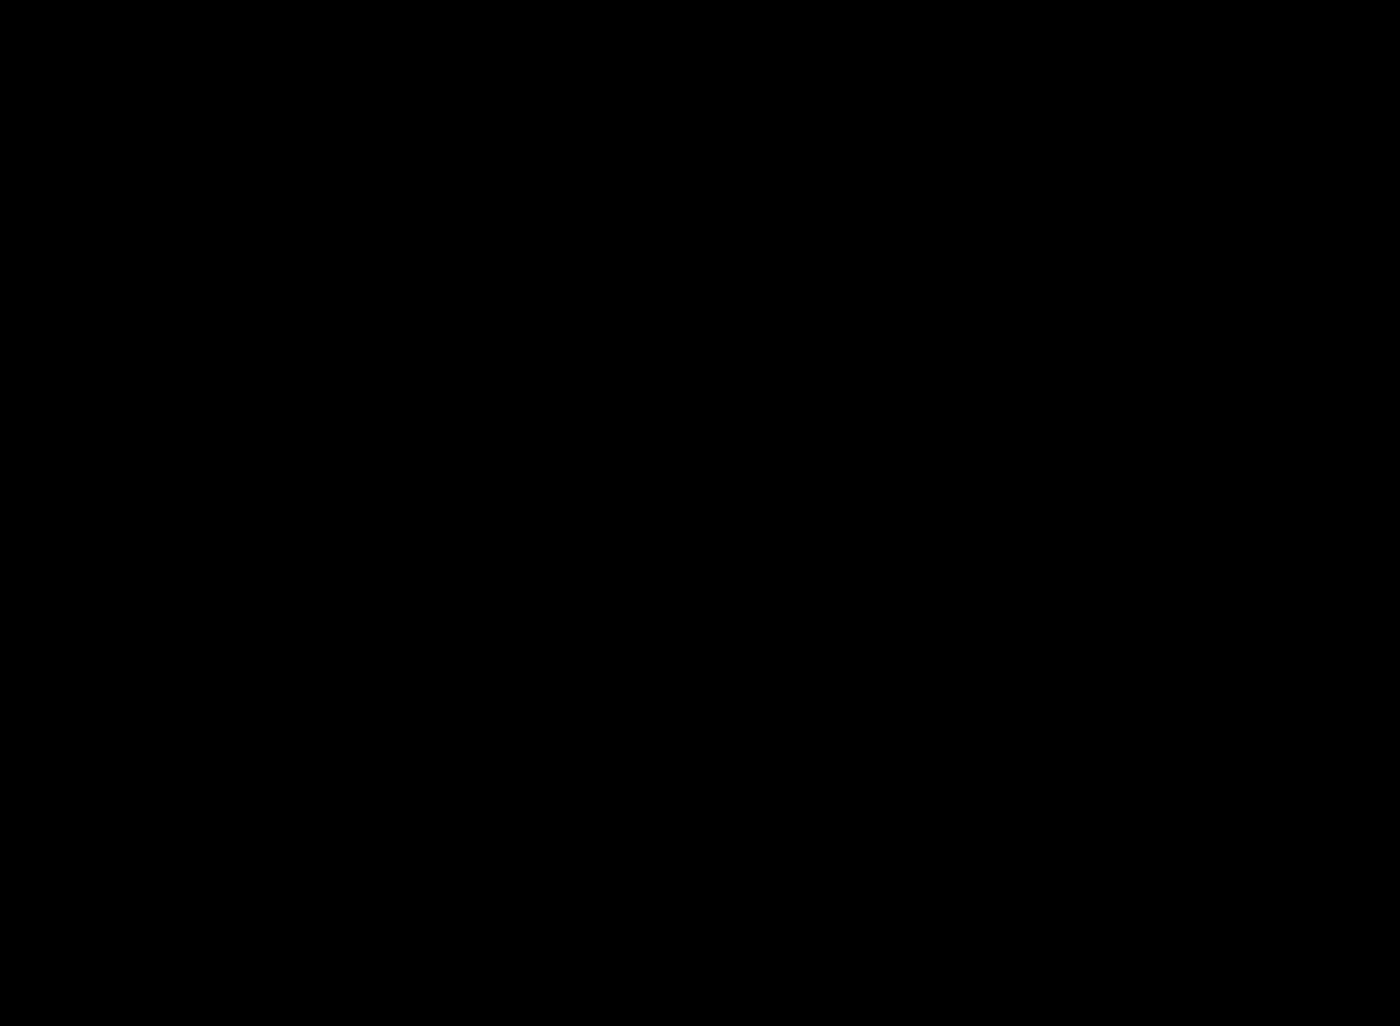 logo for the San Francisco Travel Case Study case study